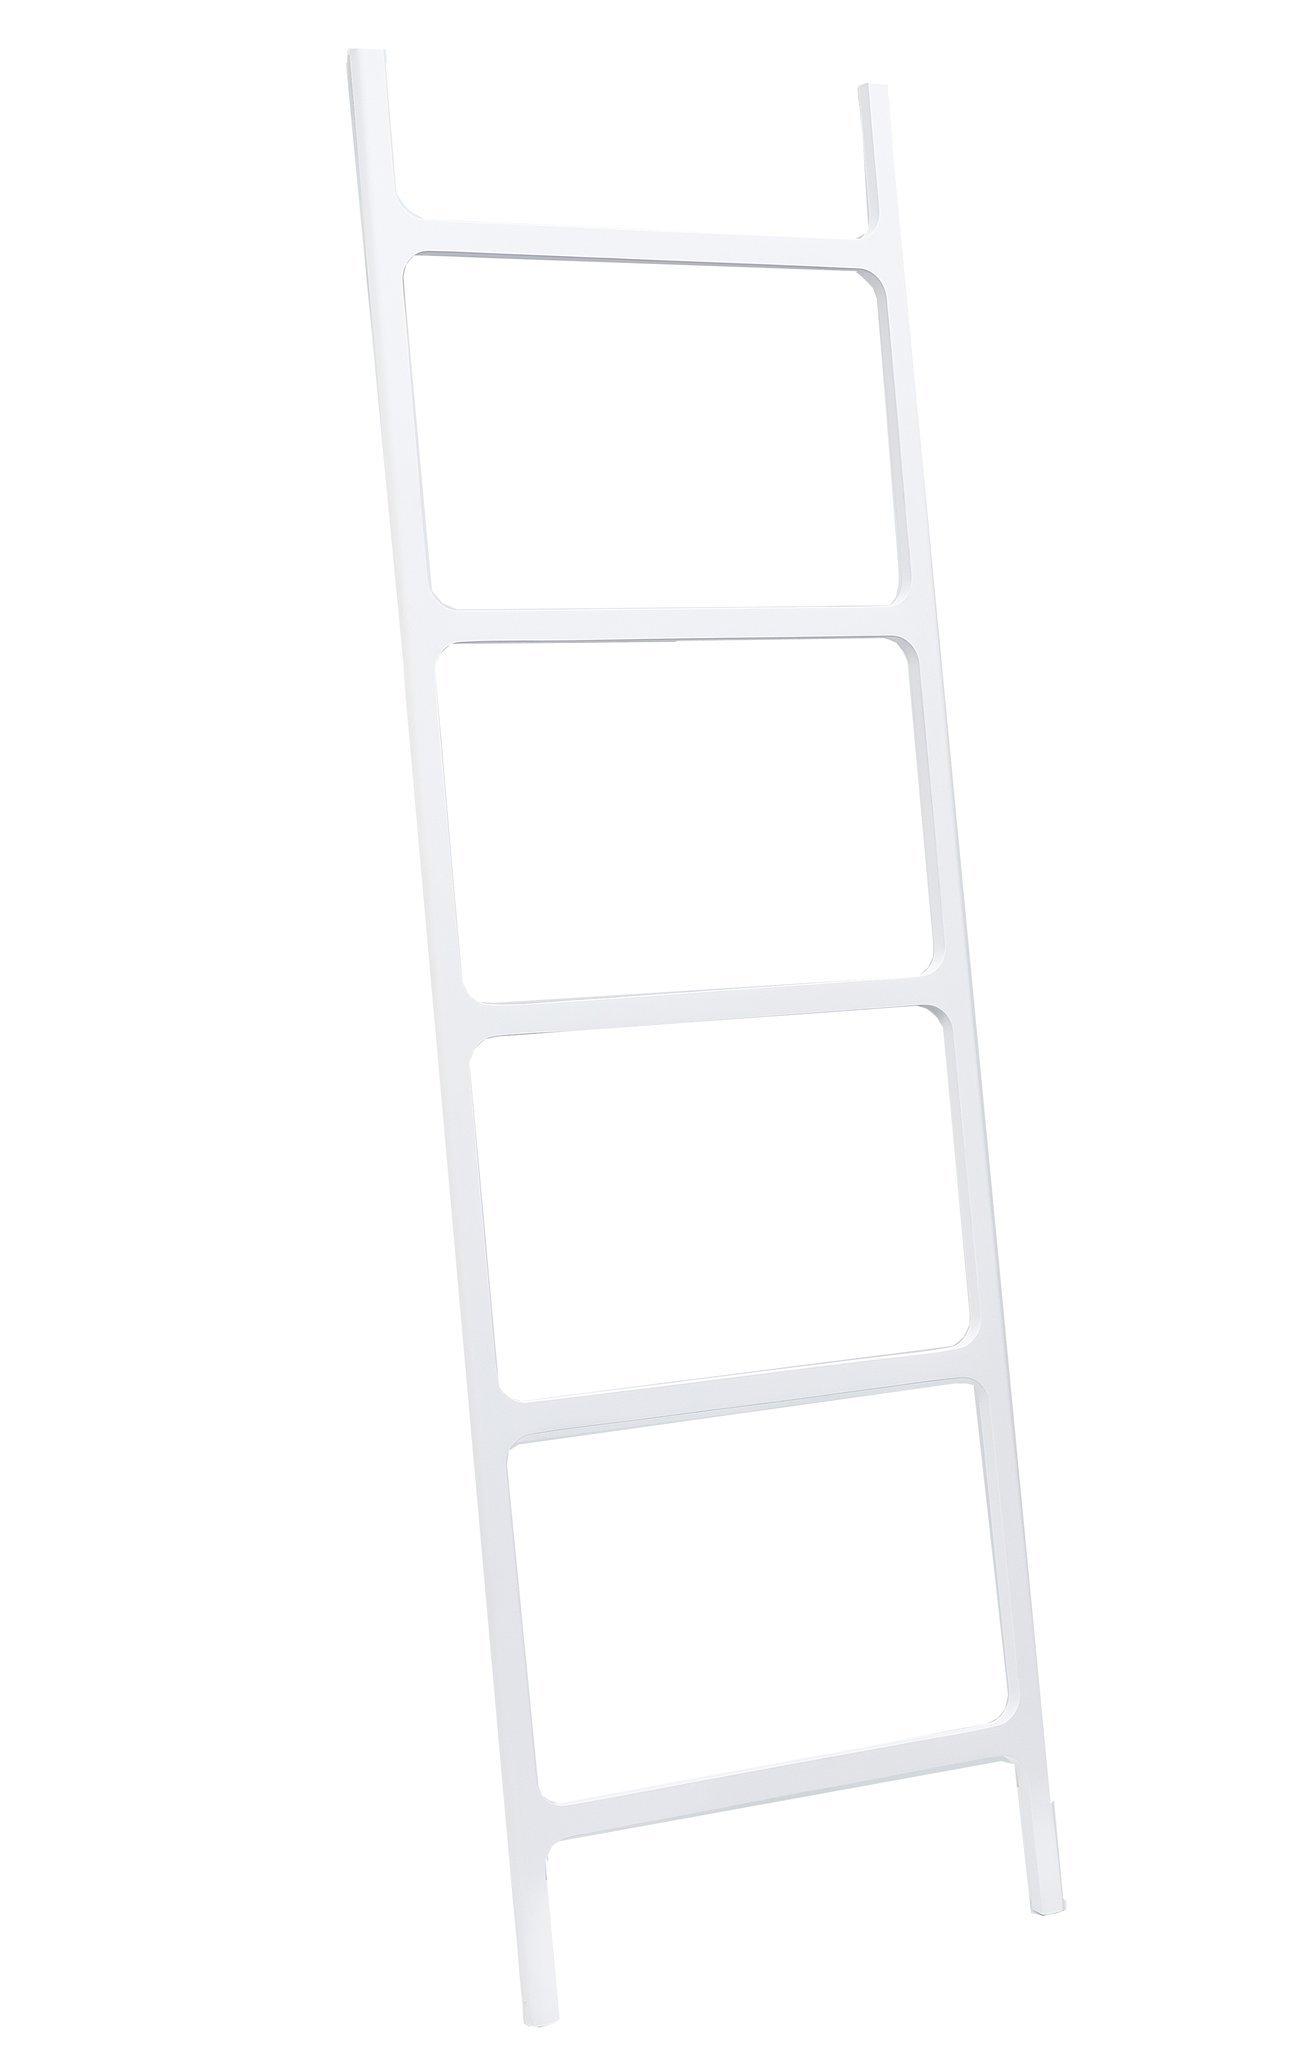 DWBA Stone Standing Towel Rack Ladder for Bathroom Spa Towel Hanger, White by DWBA Bath Collection (Image #1)